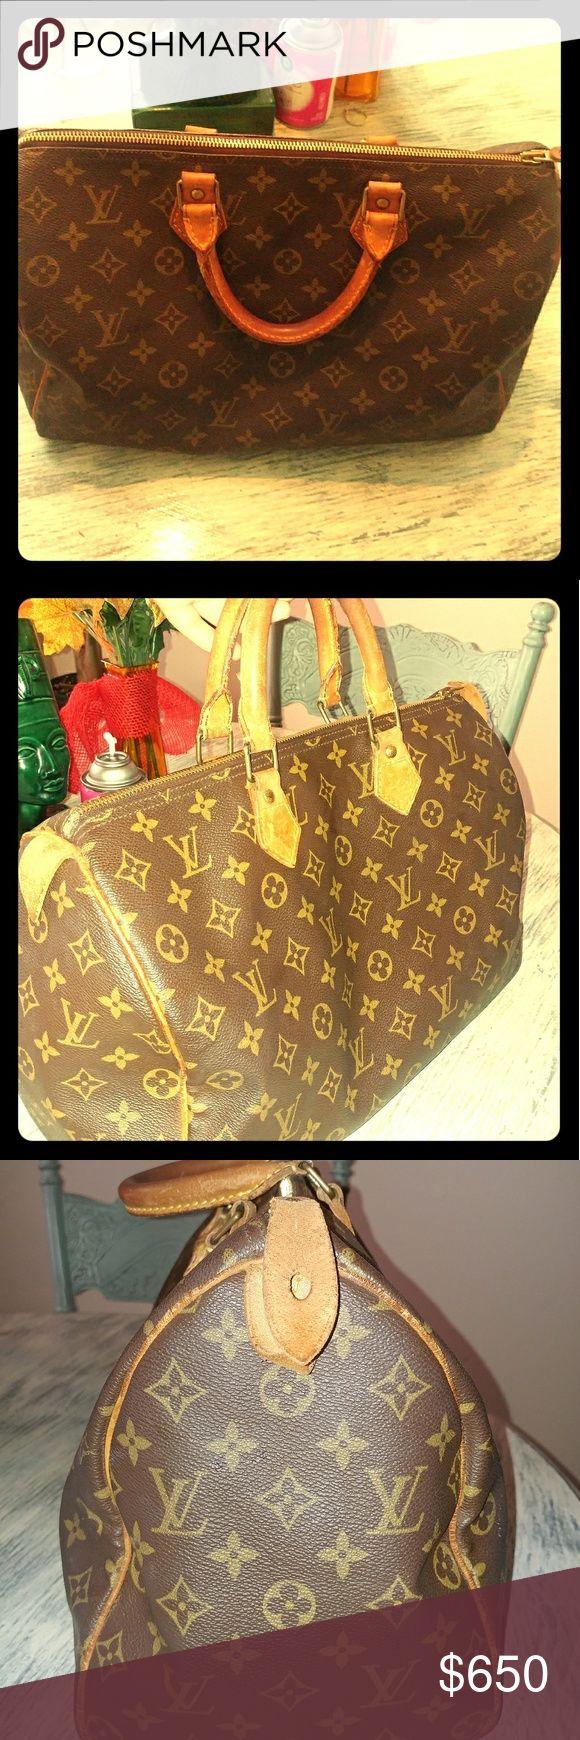 Shop Authentic, Used Louis Vuitton | Best Designer ...